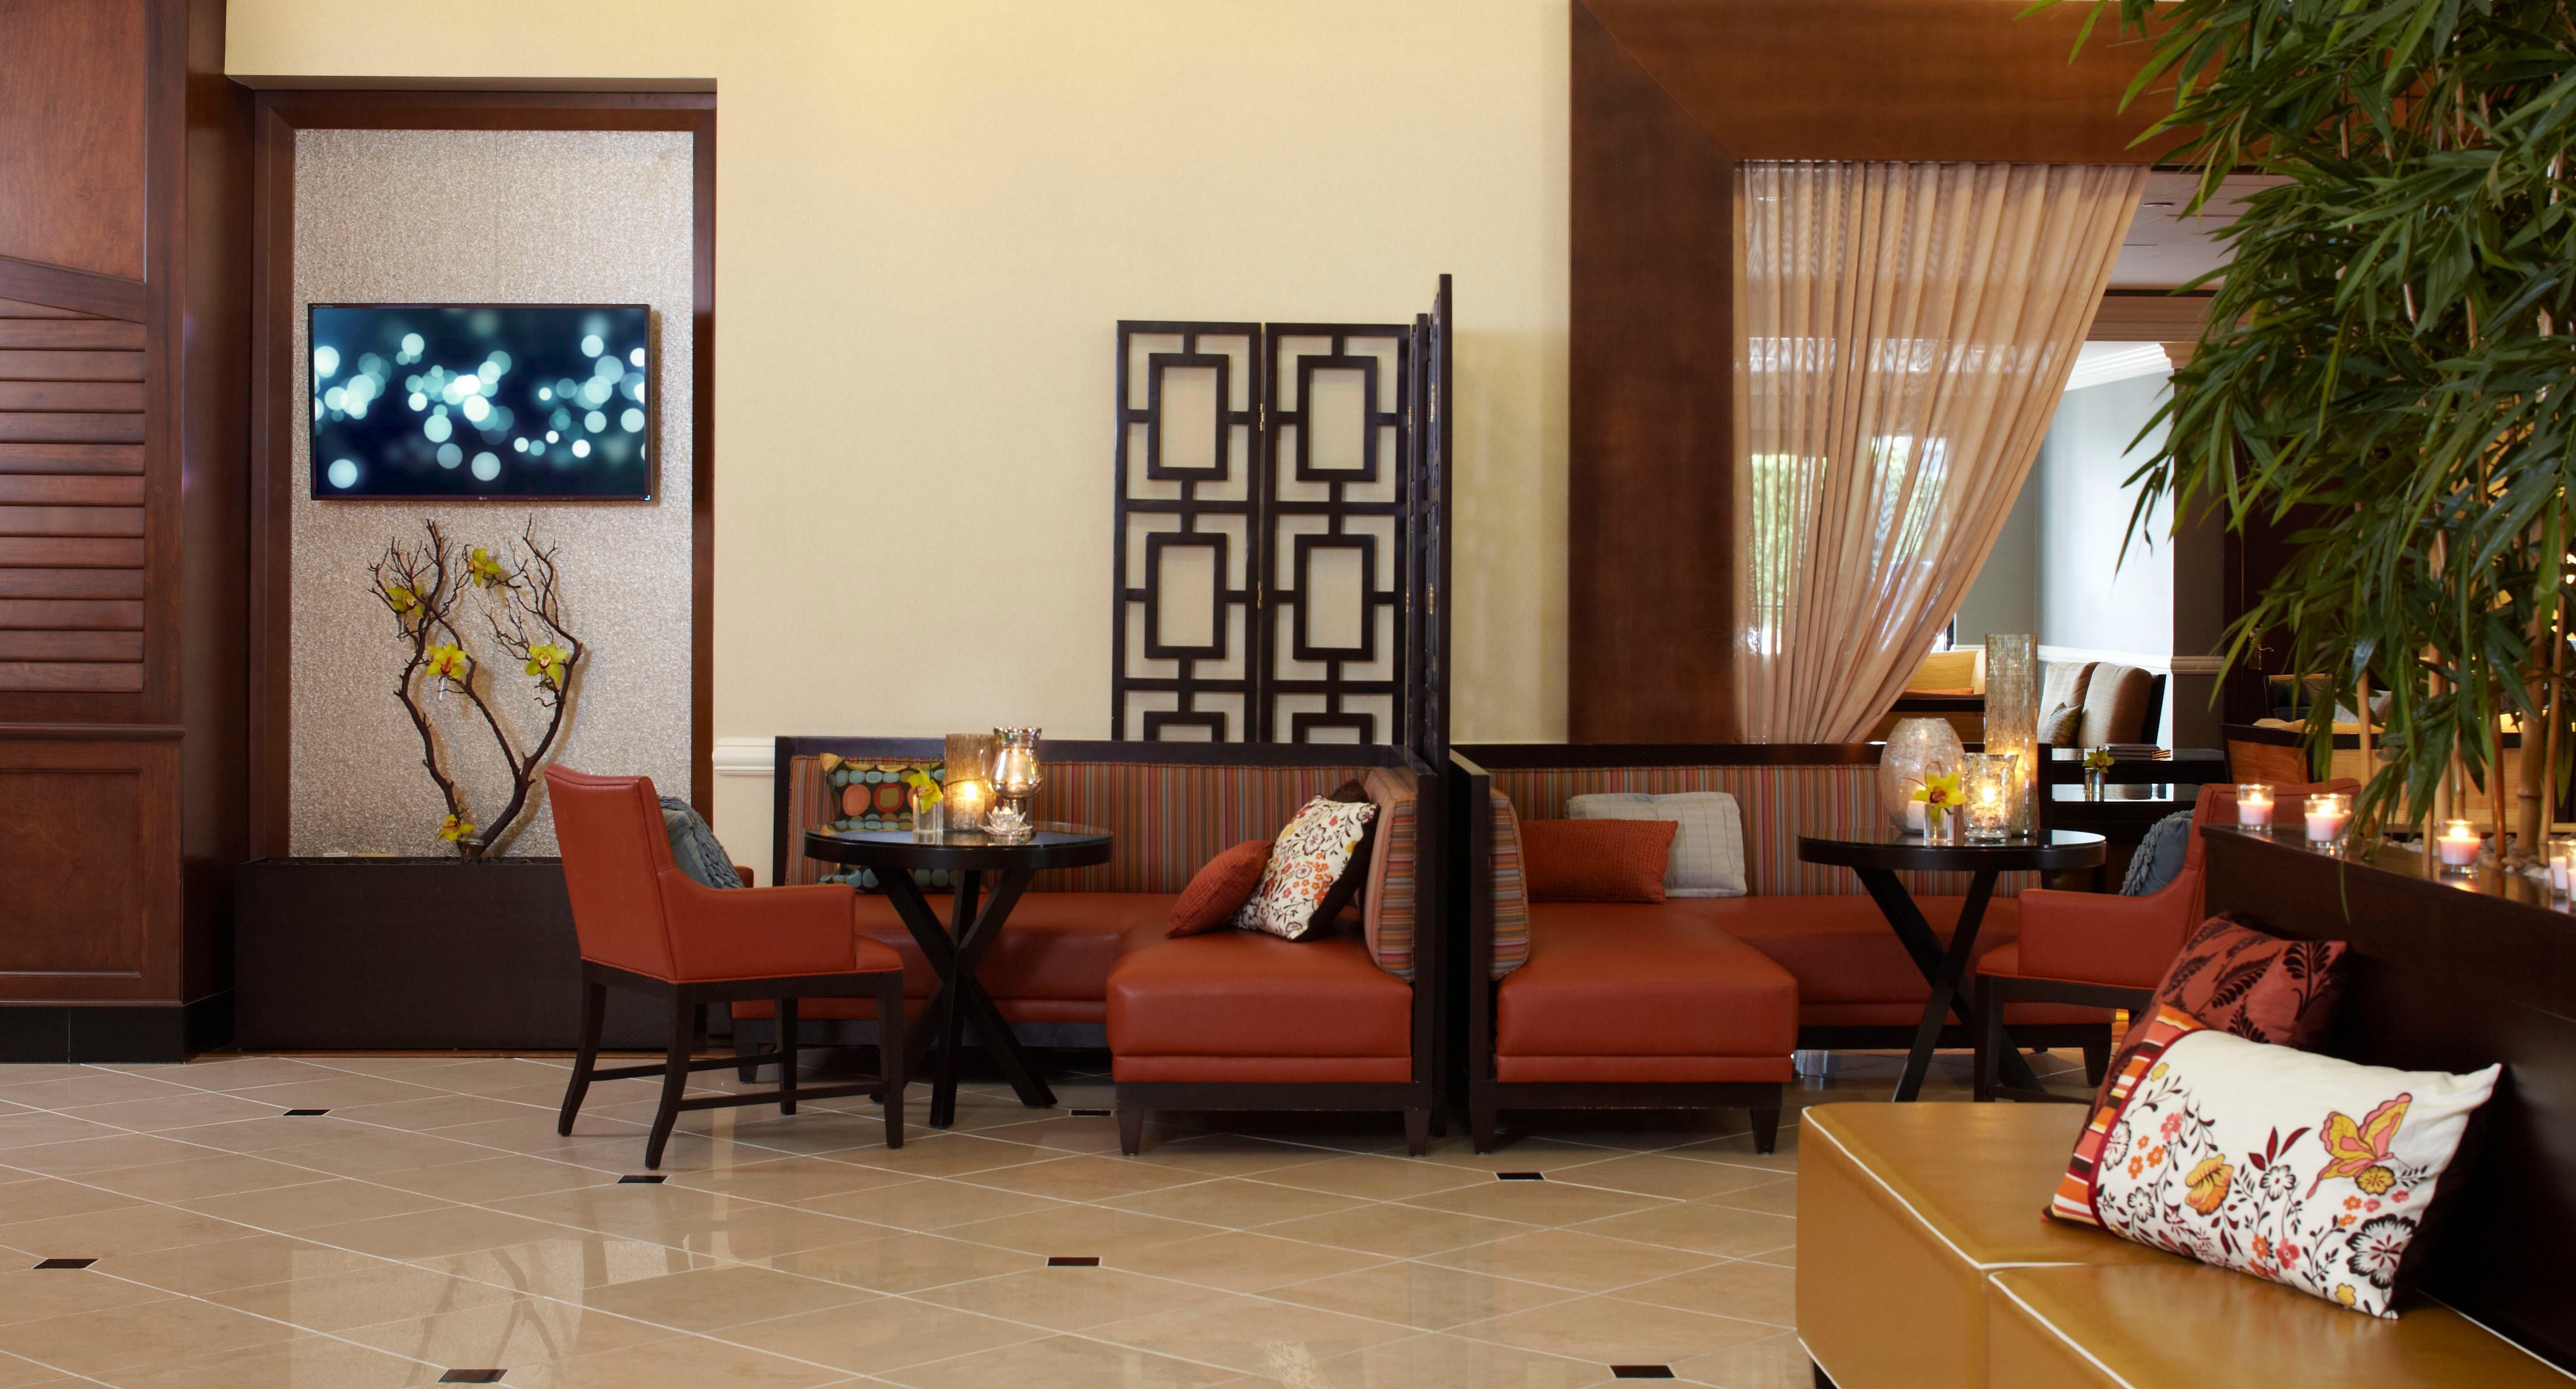 Renaissance Fort Lauderdale Cruise Port Hotel image 22